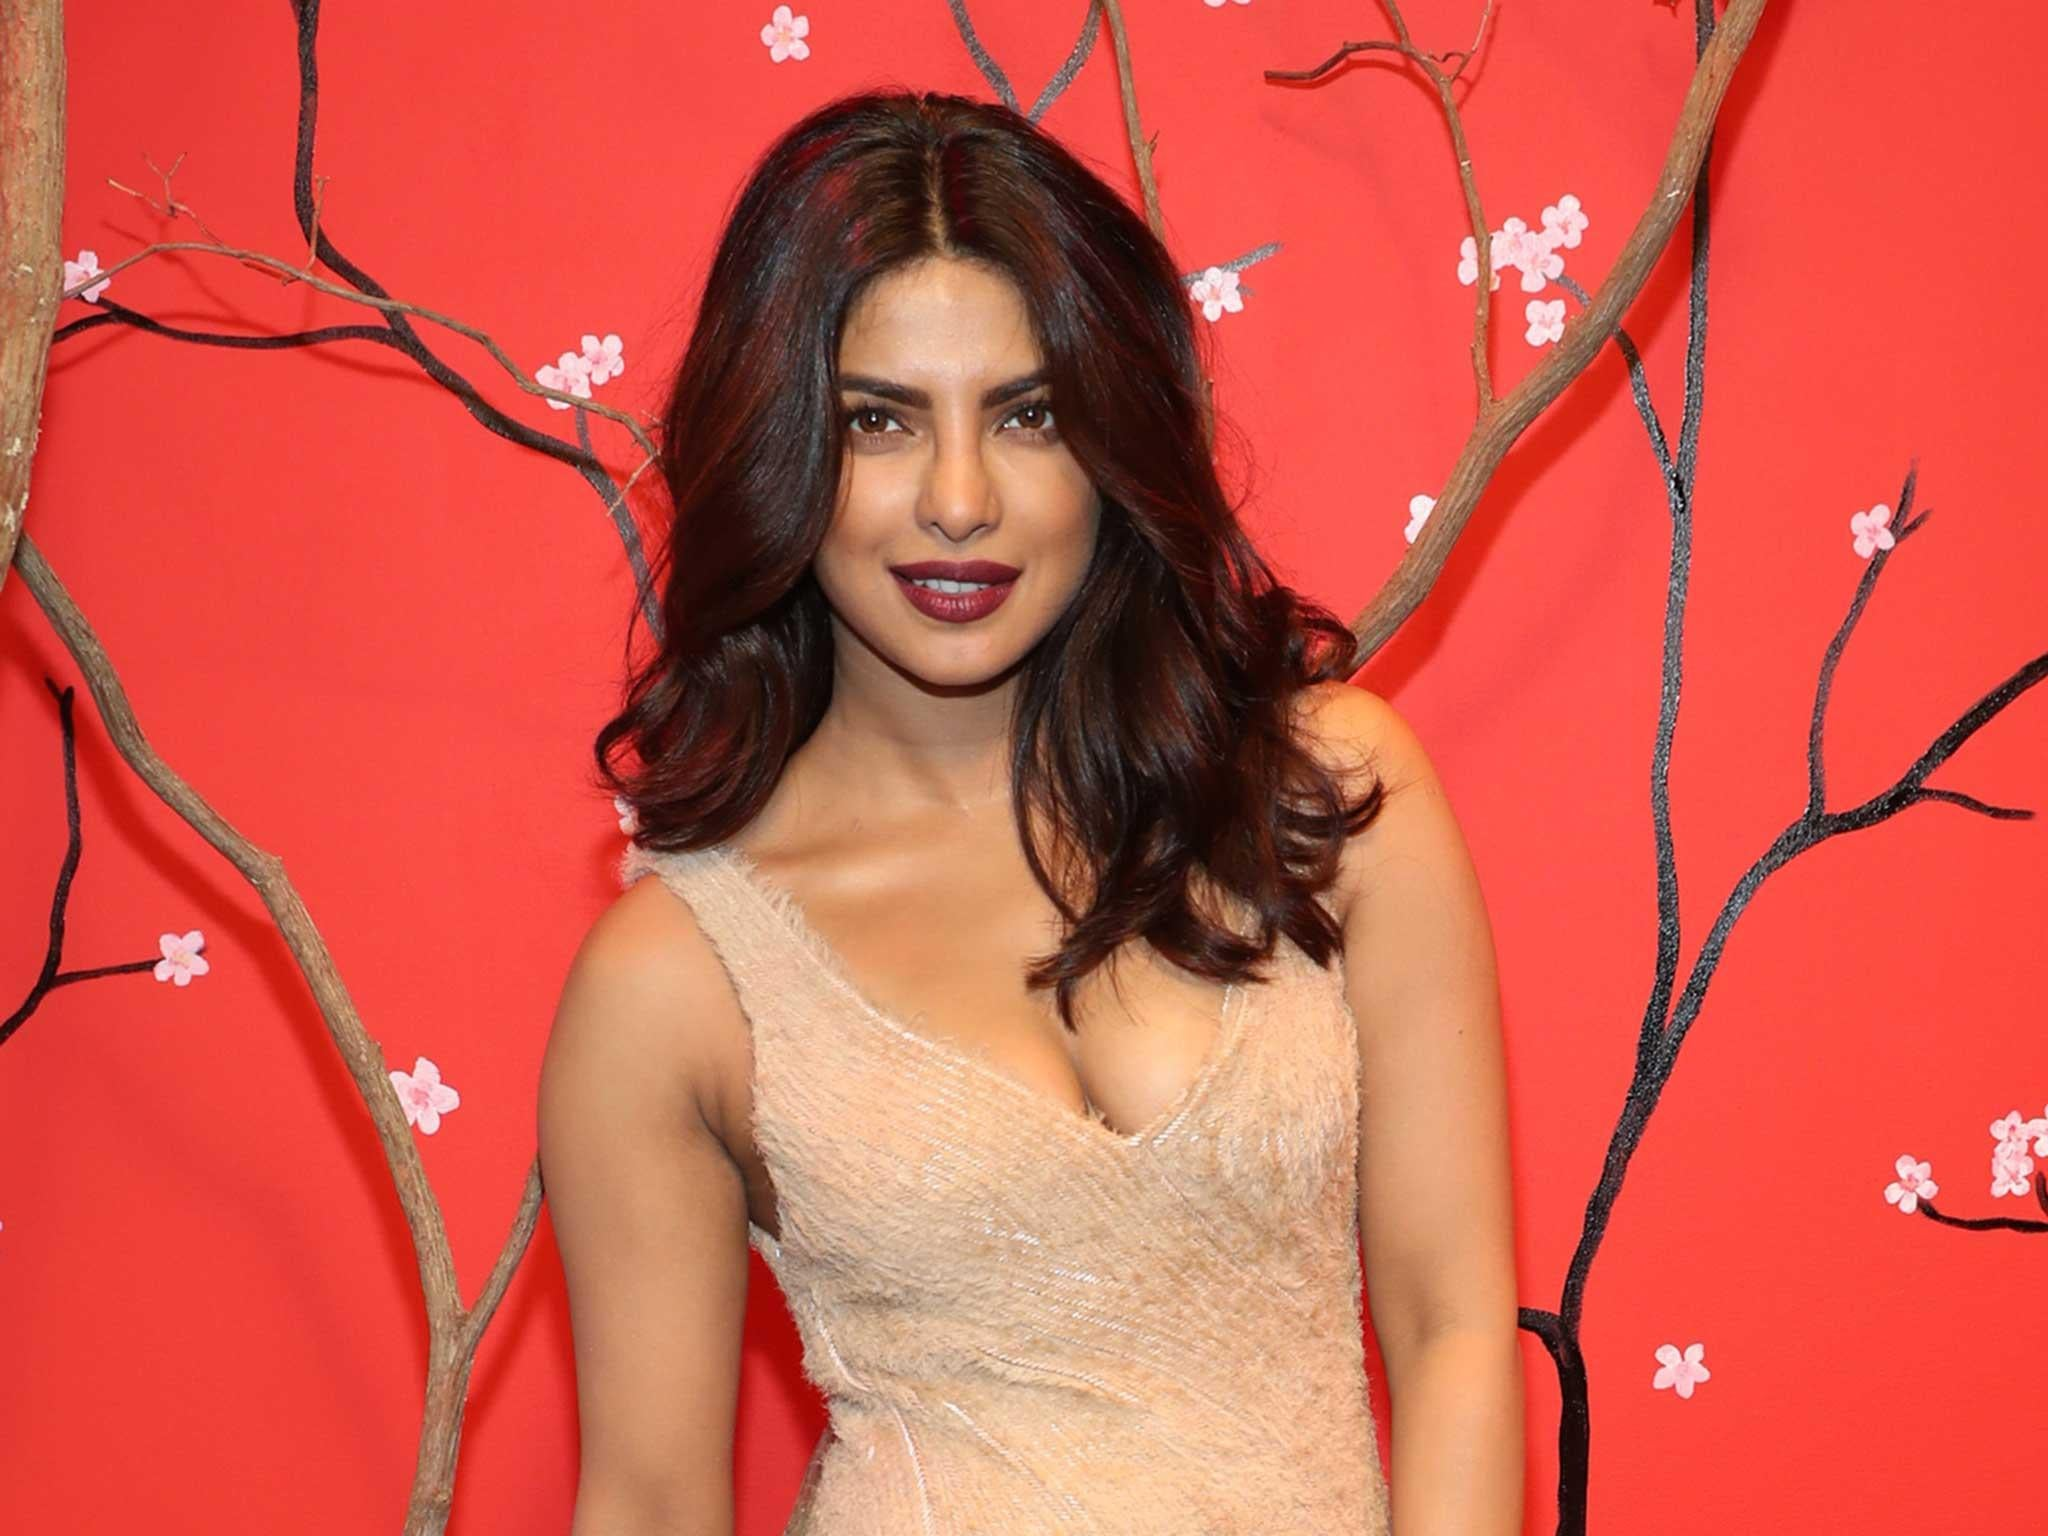 priyanka chopra 'feels horrible' after backlash for wearing